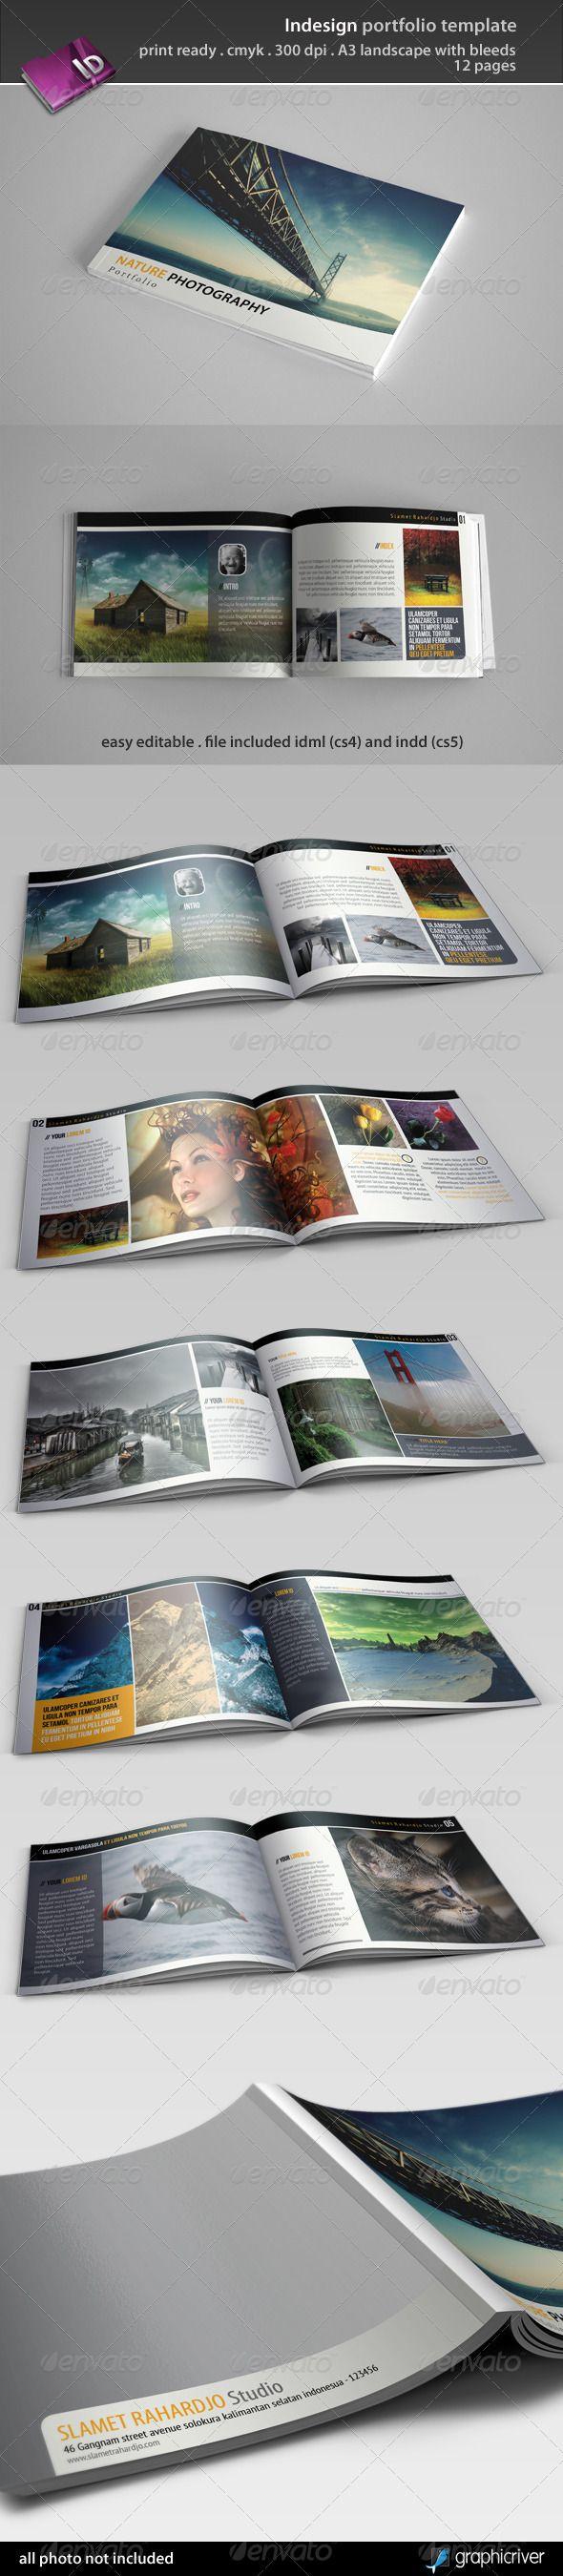 indesign portfolio template photobook pinterest